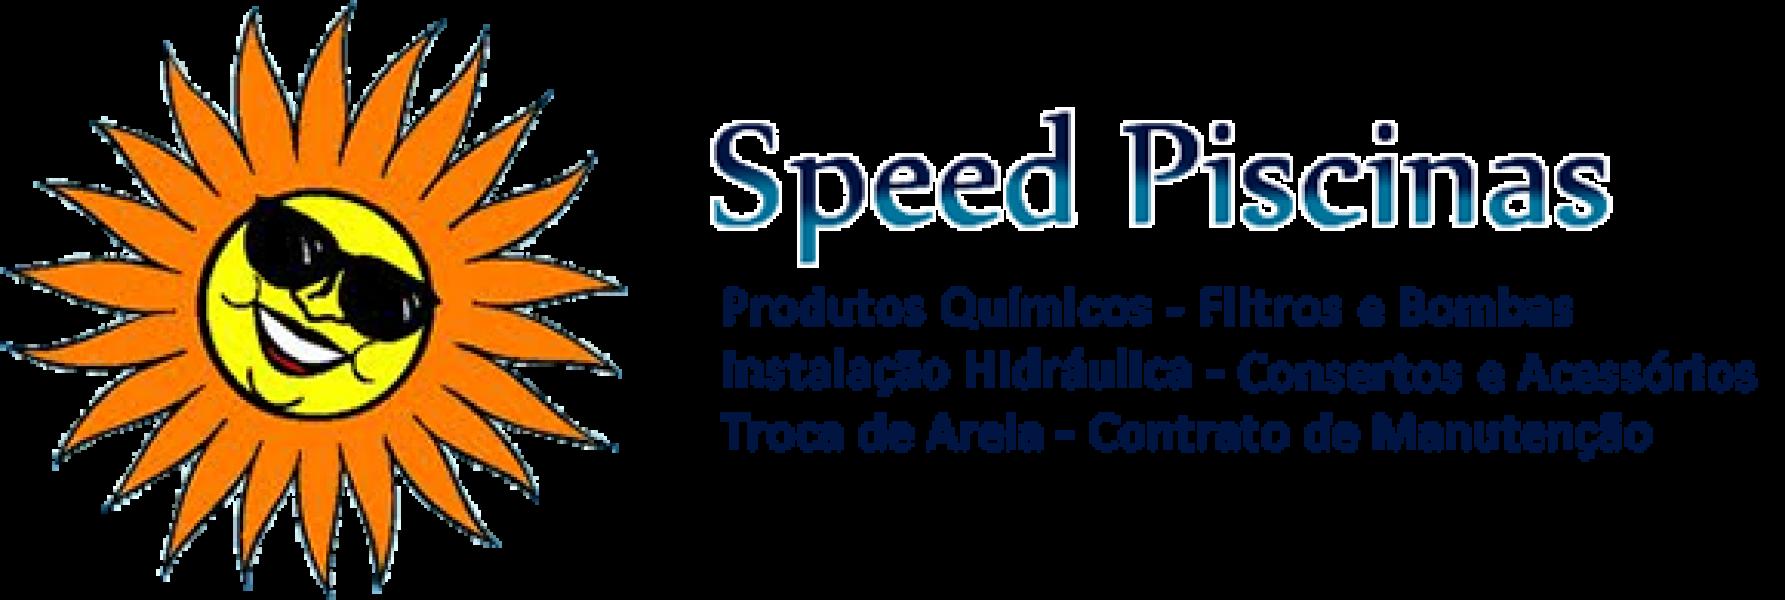 Speed Piscinas